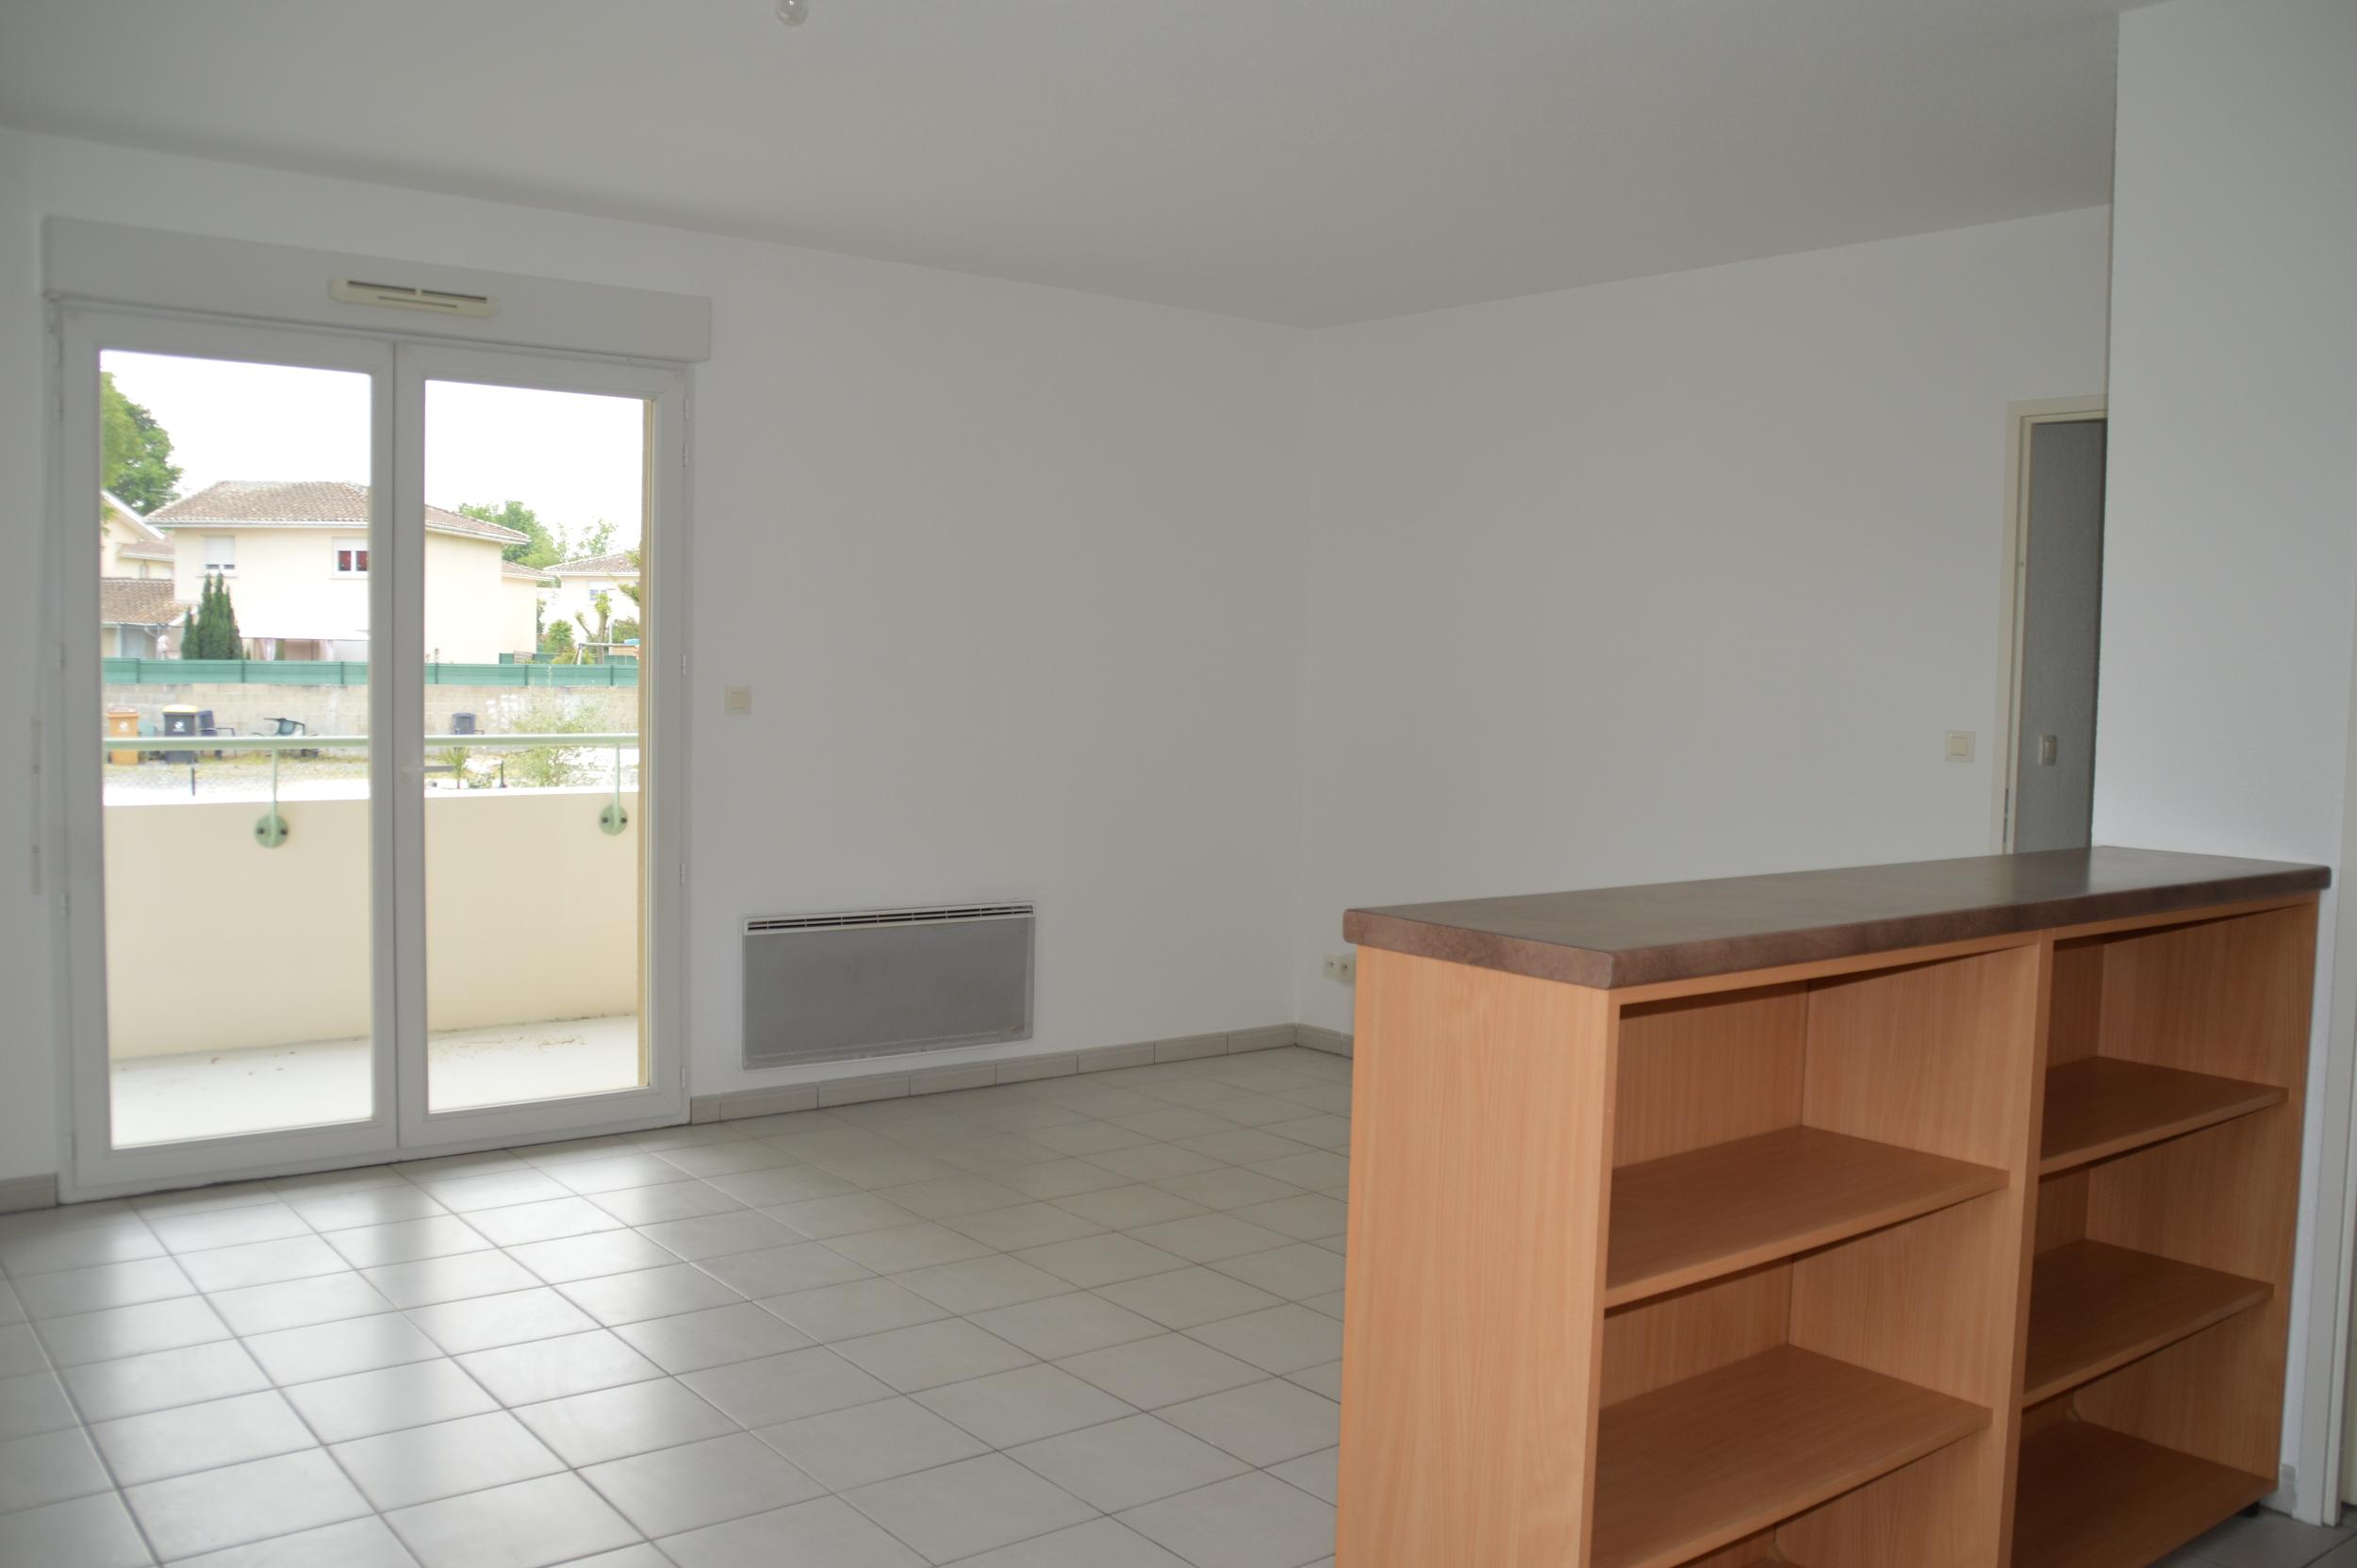 vente Appartement 2 pièces Cavignac 33620